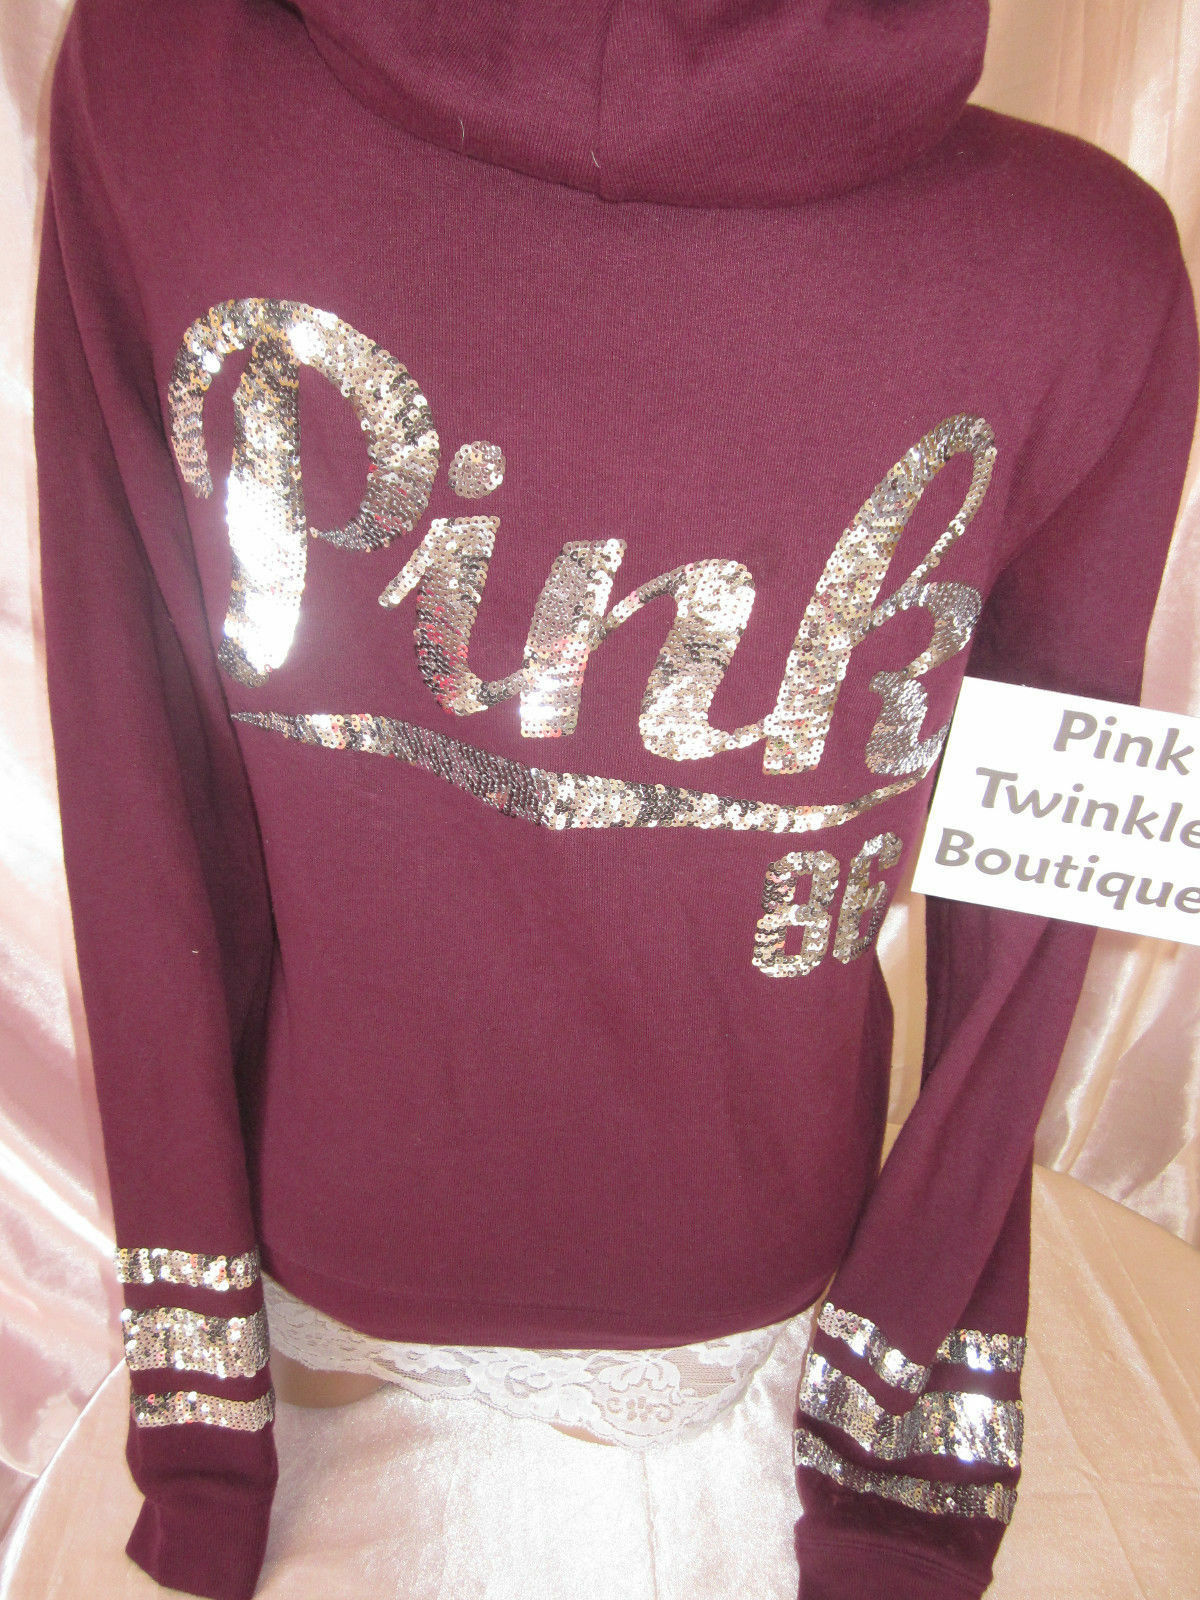 Victorias Secret PINK Womens Hoodie Small Zip Sweatshirt Sweatshirt Sweatshirt Sequin Bling Burgundy 26f8b1